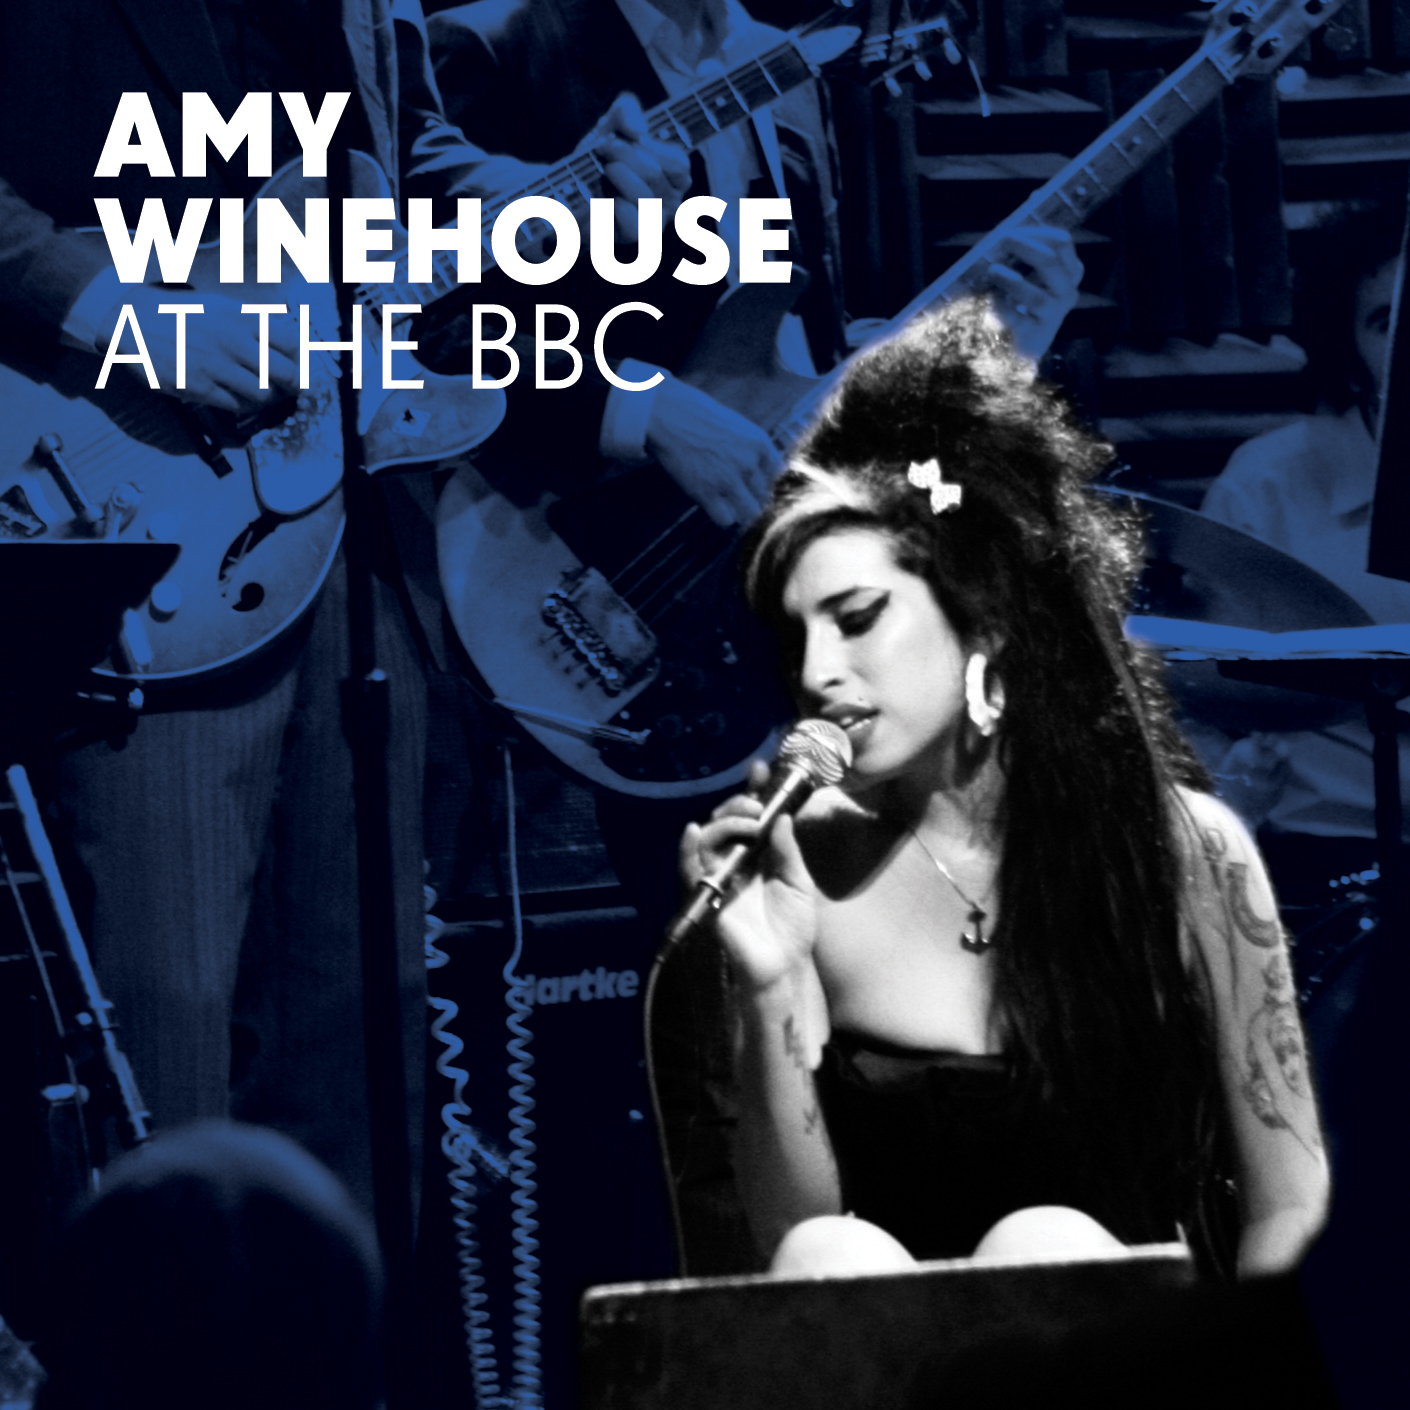 http://4.bp.blogspot.com/-EkCosGxu2wU/UH_TkfpgRqI/AAAAAAAAFQI/YgjB4UpDRIo/s1600/amy-winehouse-at-the-bbc-artwork.jpeg